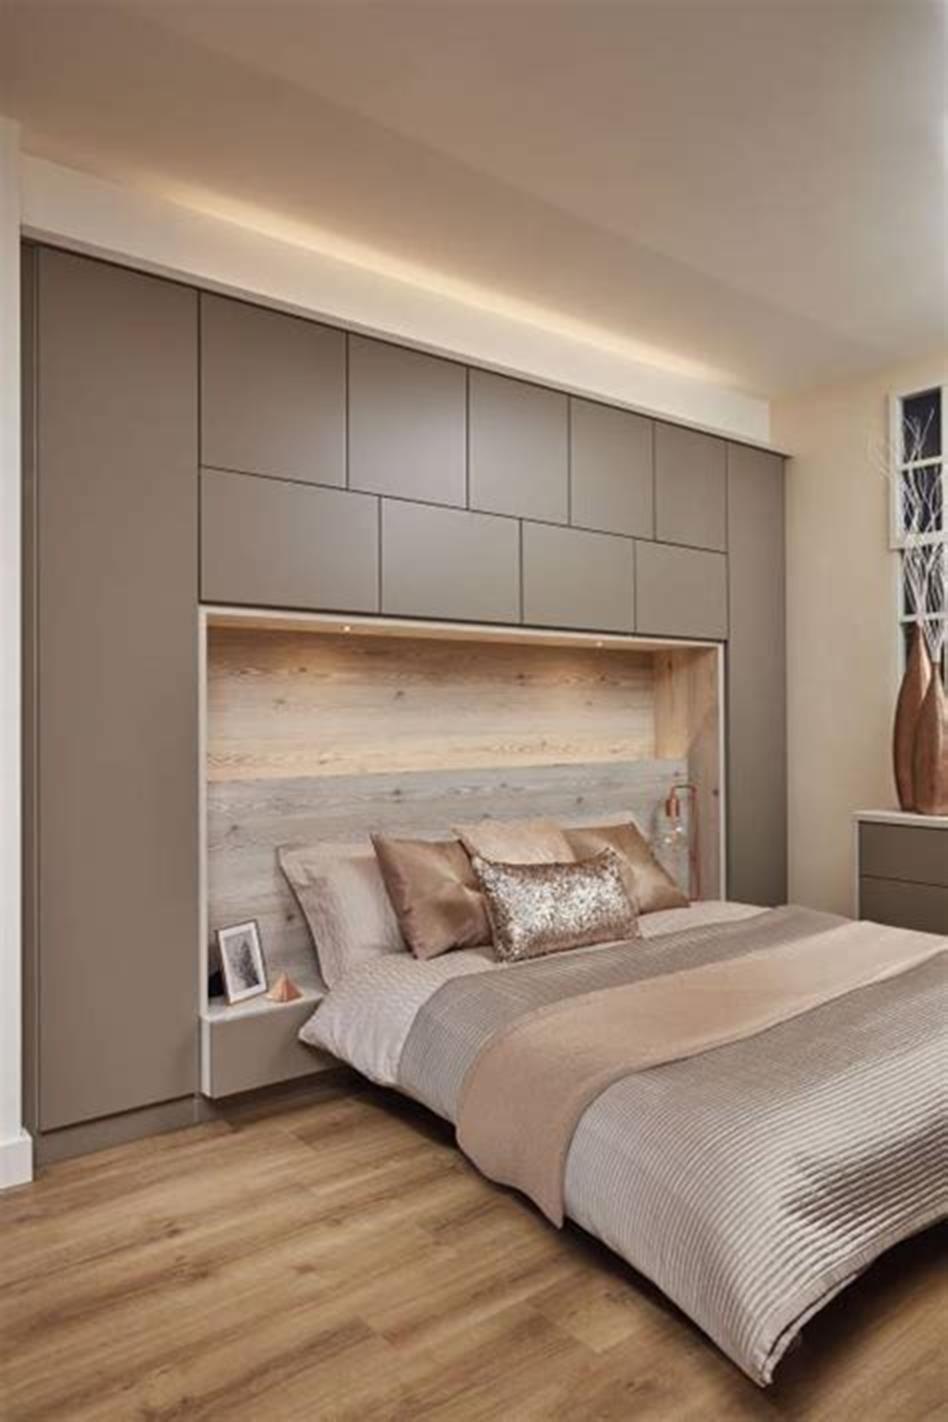 40 Cozy Minimalist Bedroom Decorating Ideas In 2019 Small Master Bedroom Modern Master Bedroom Modern Bedroom Design